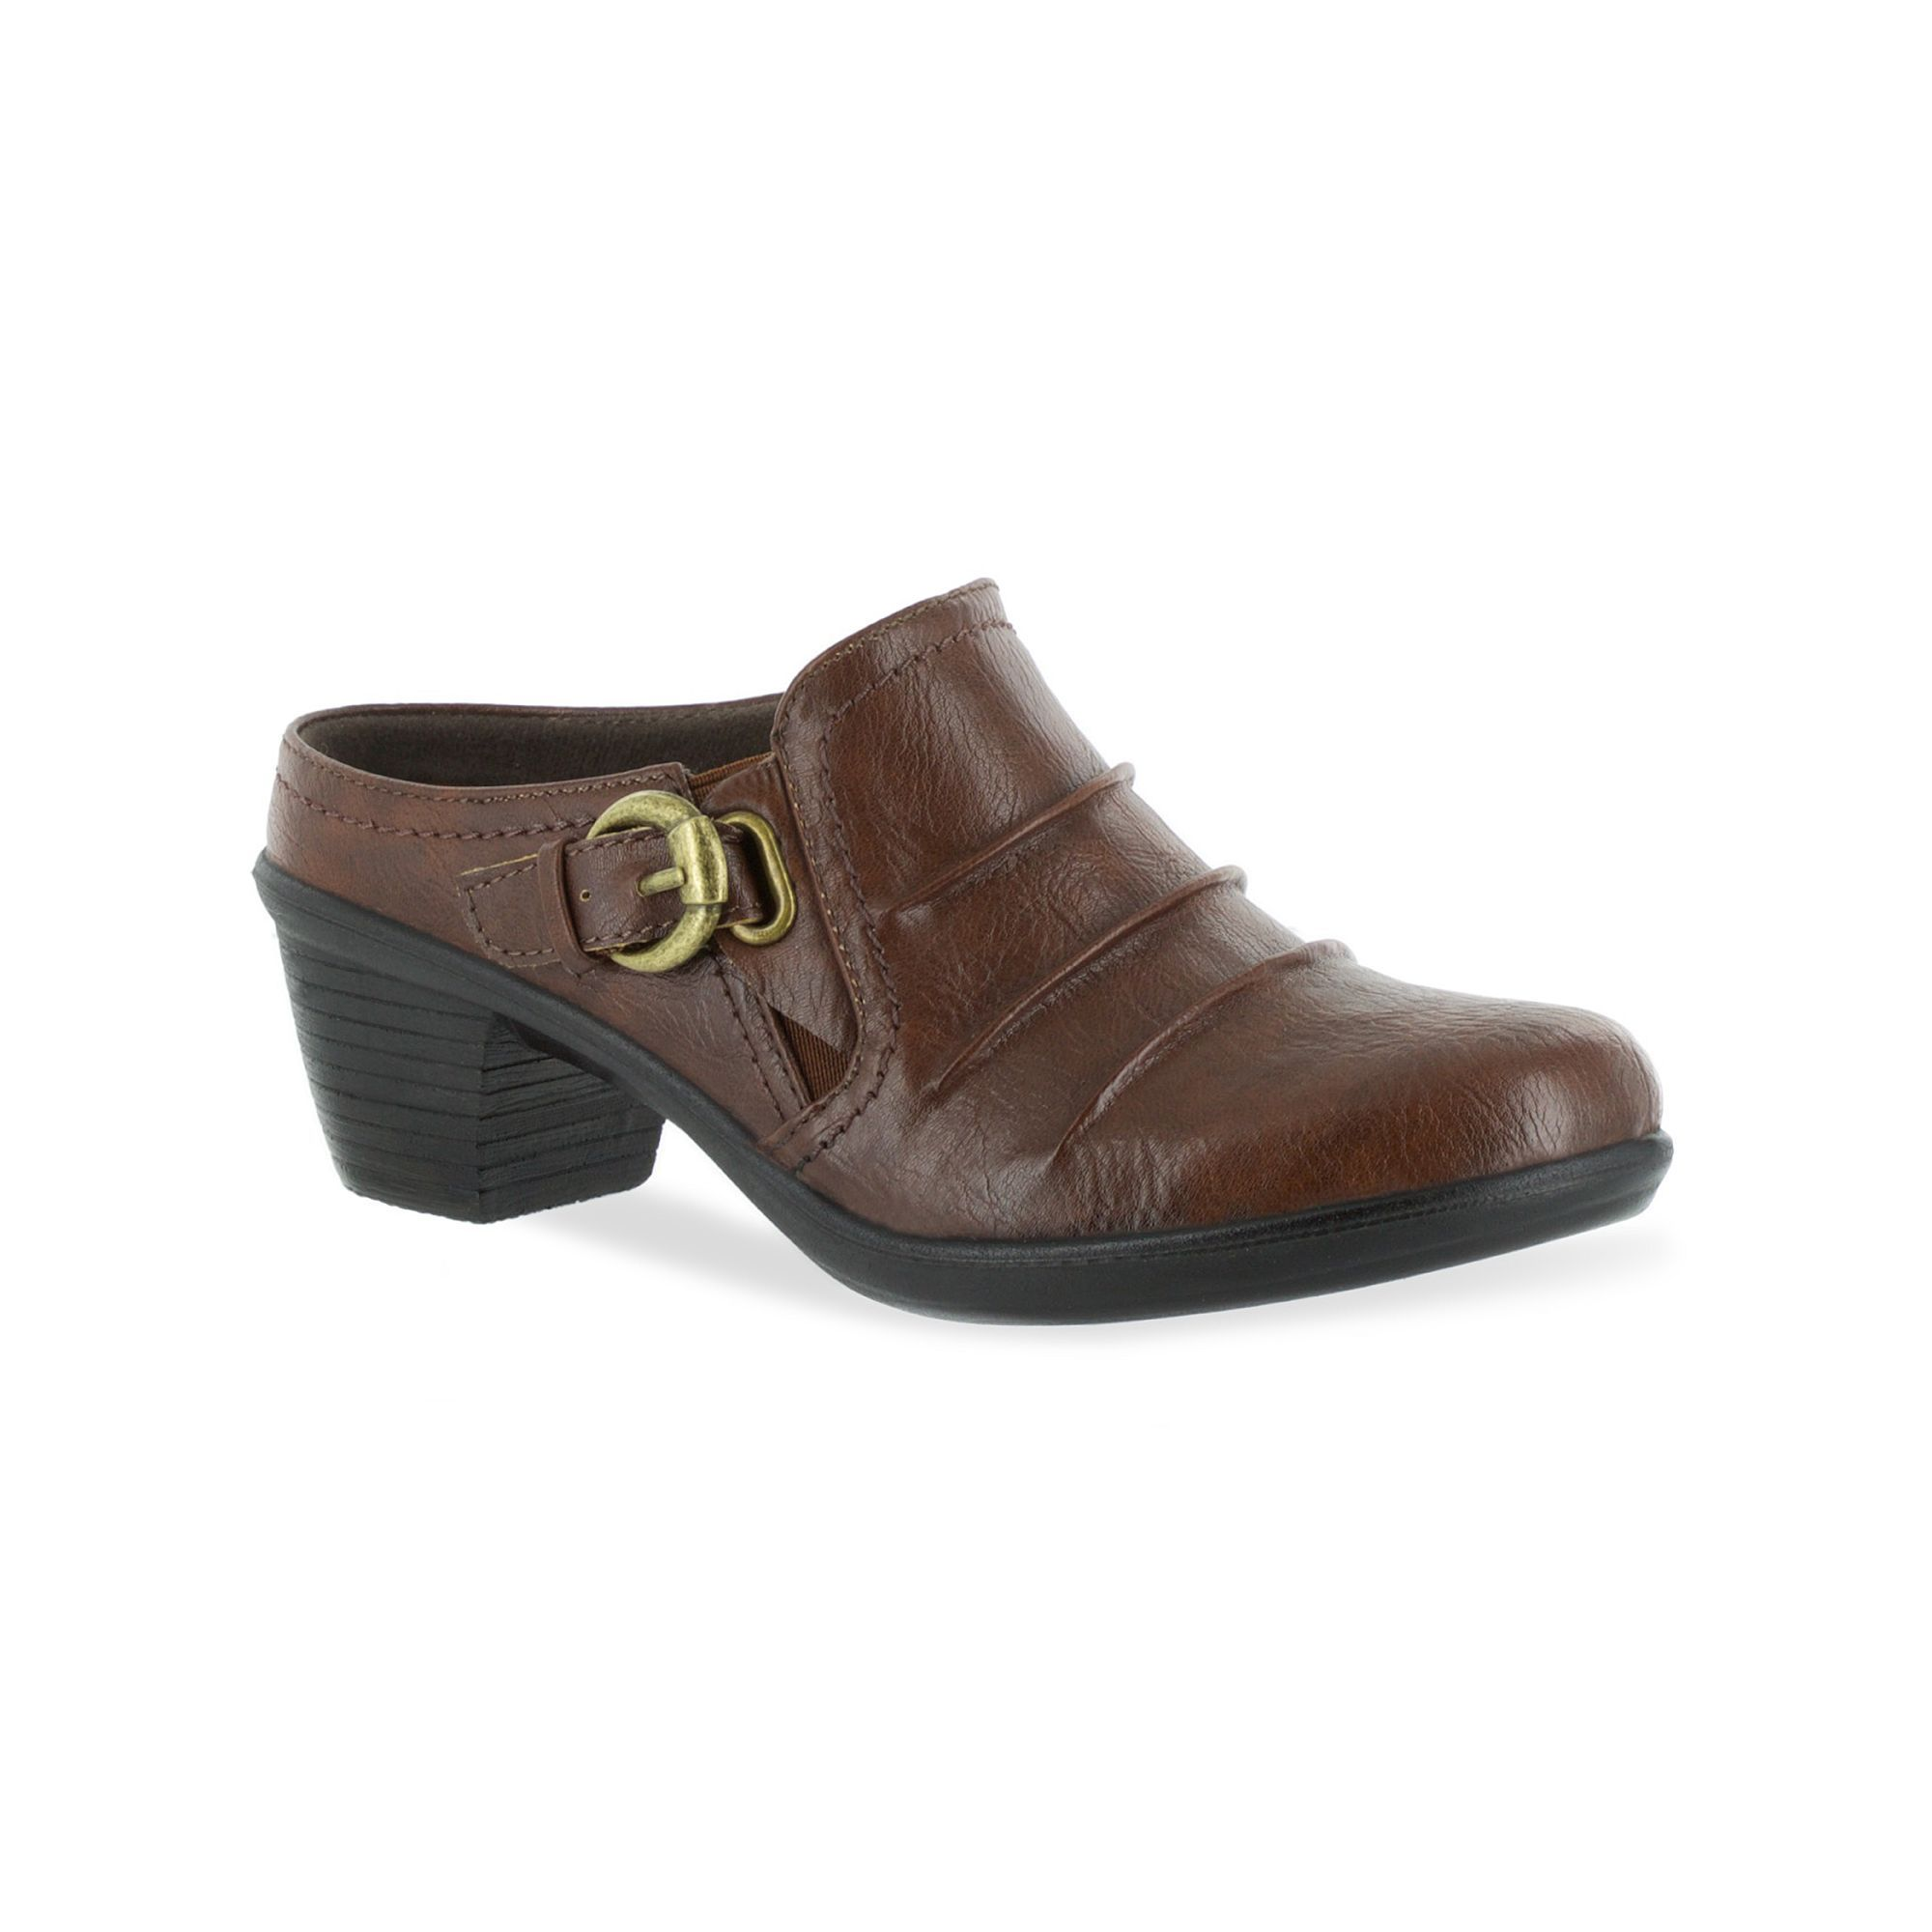 d34aa92ffaf9 Easy Street Shoes Calm Women s Comfort Mules